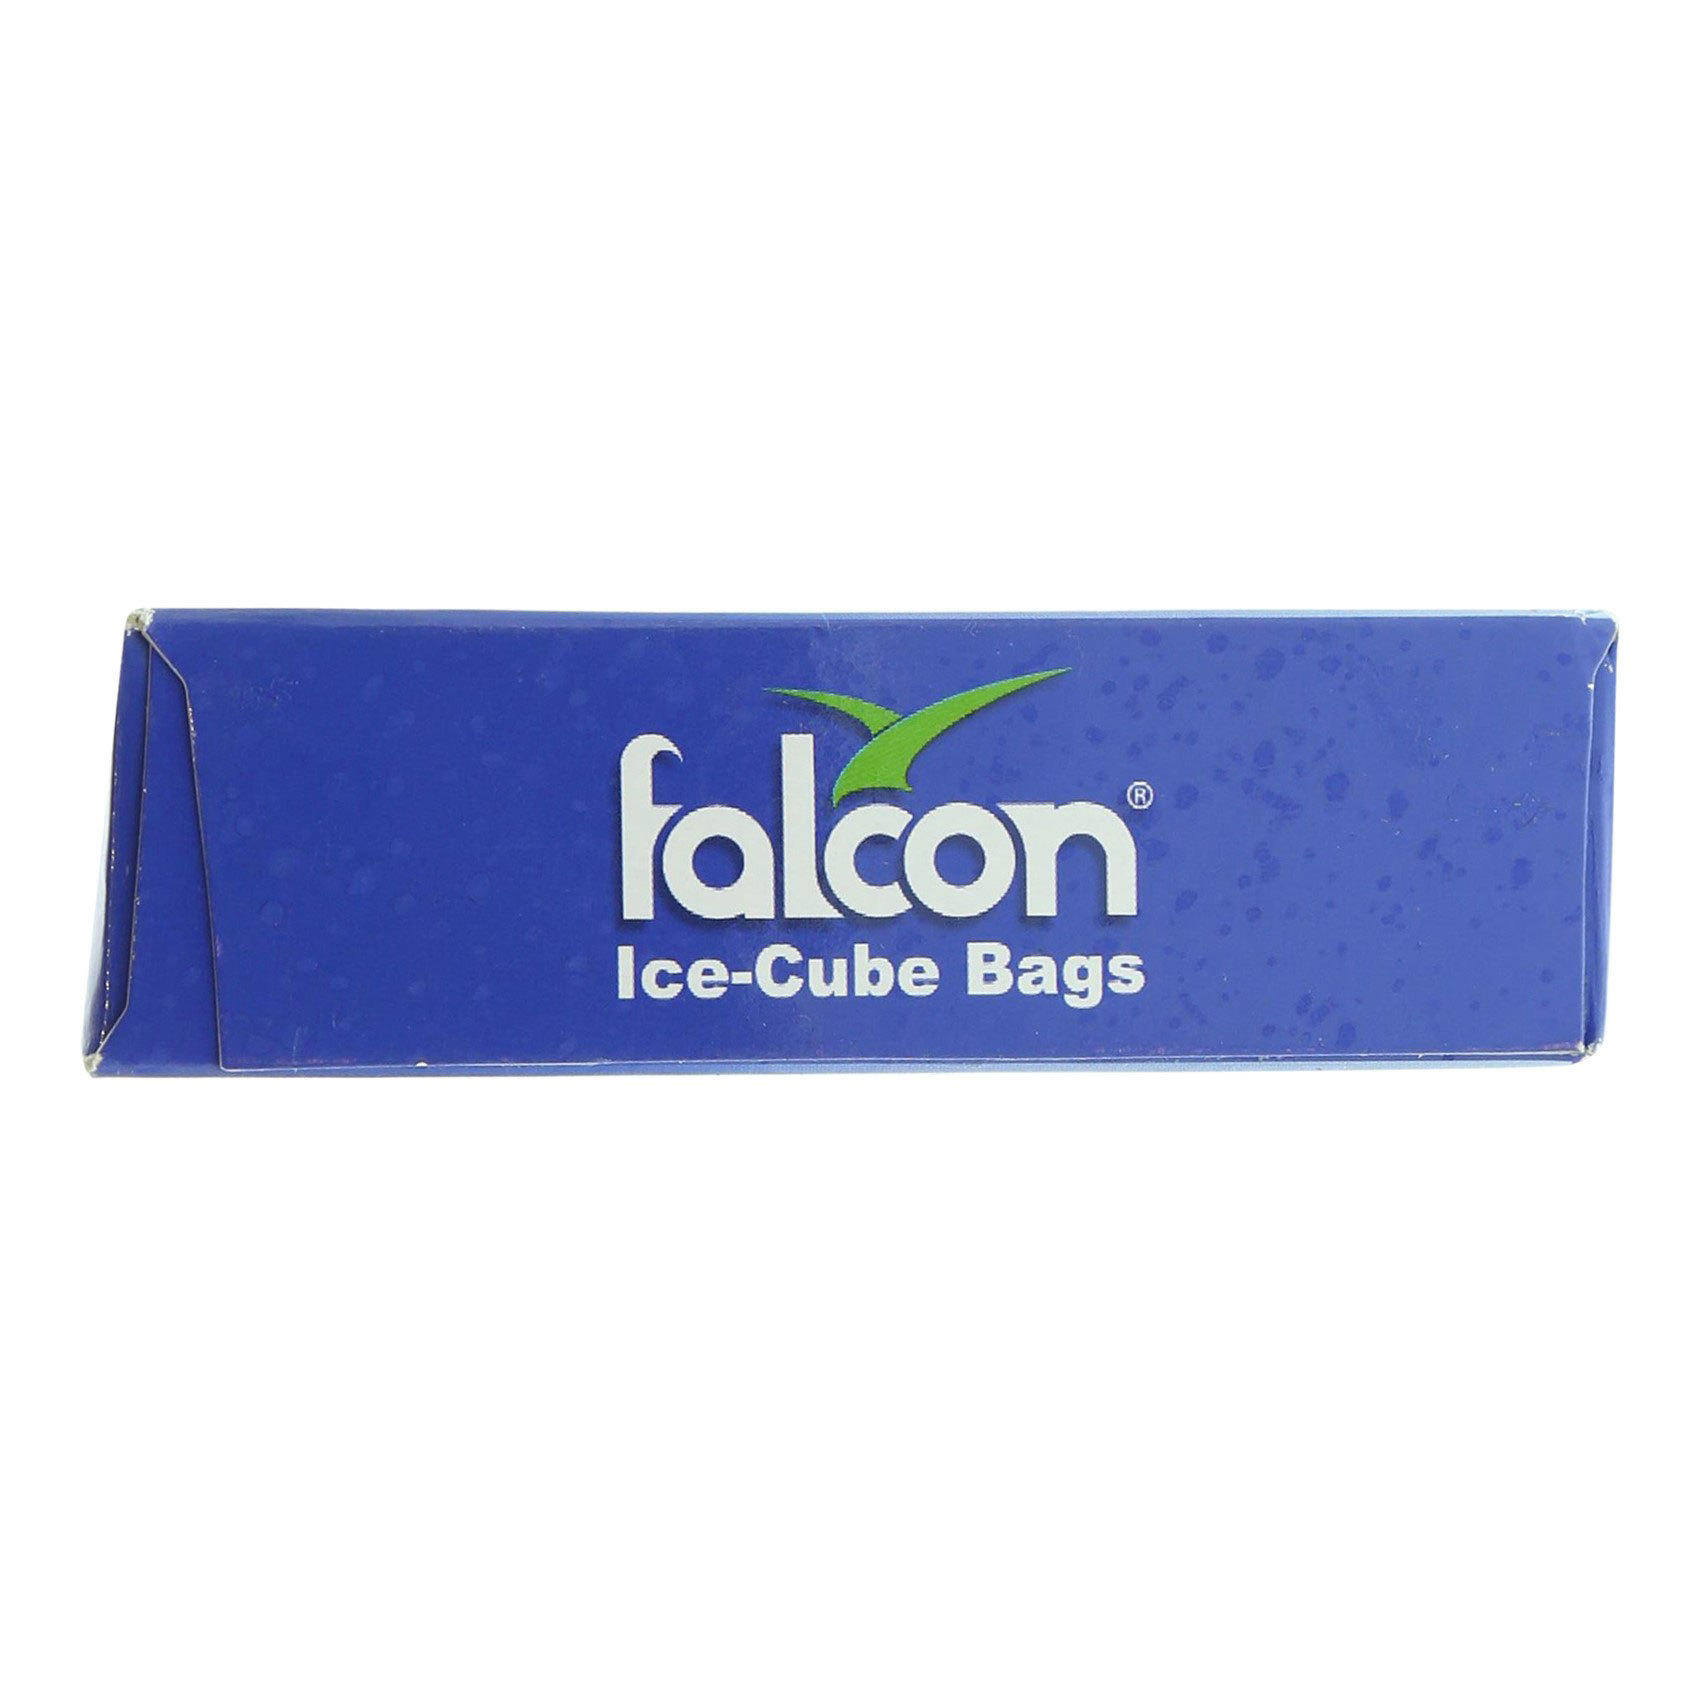 FALCON ICE CUBE BAG